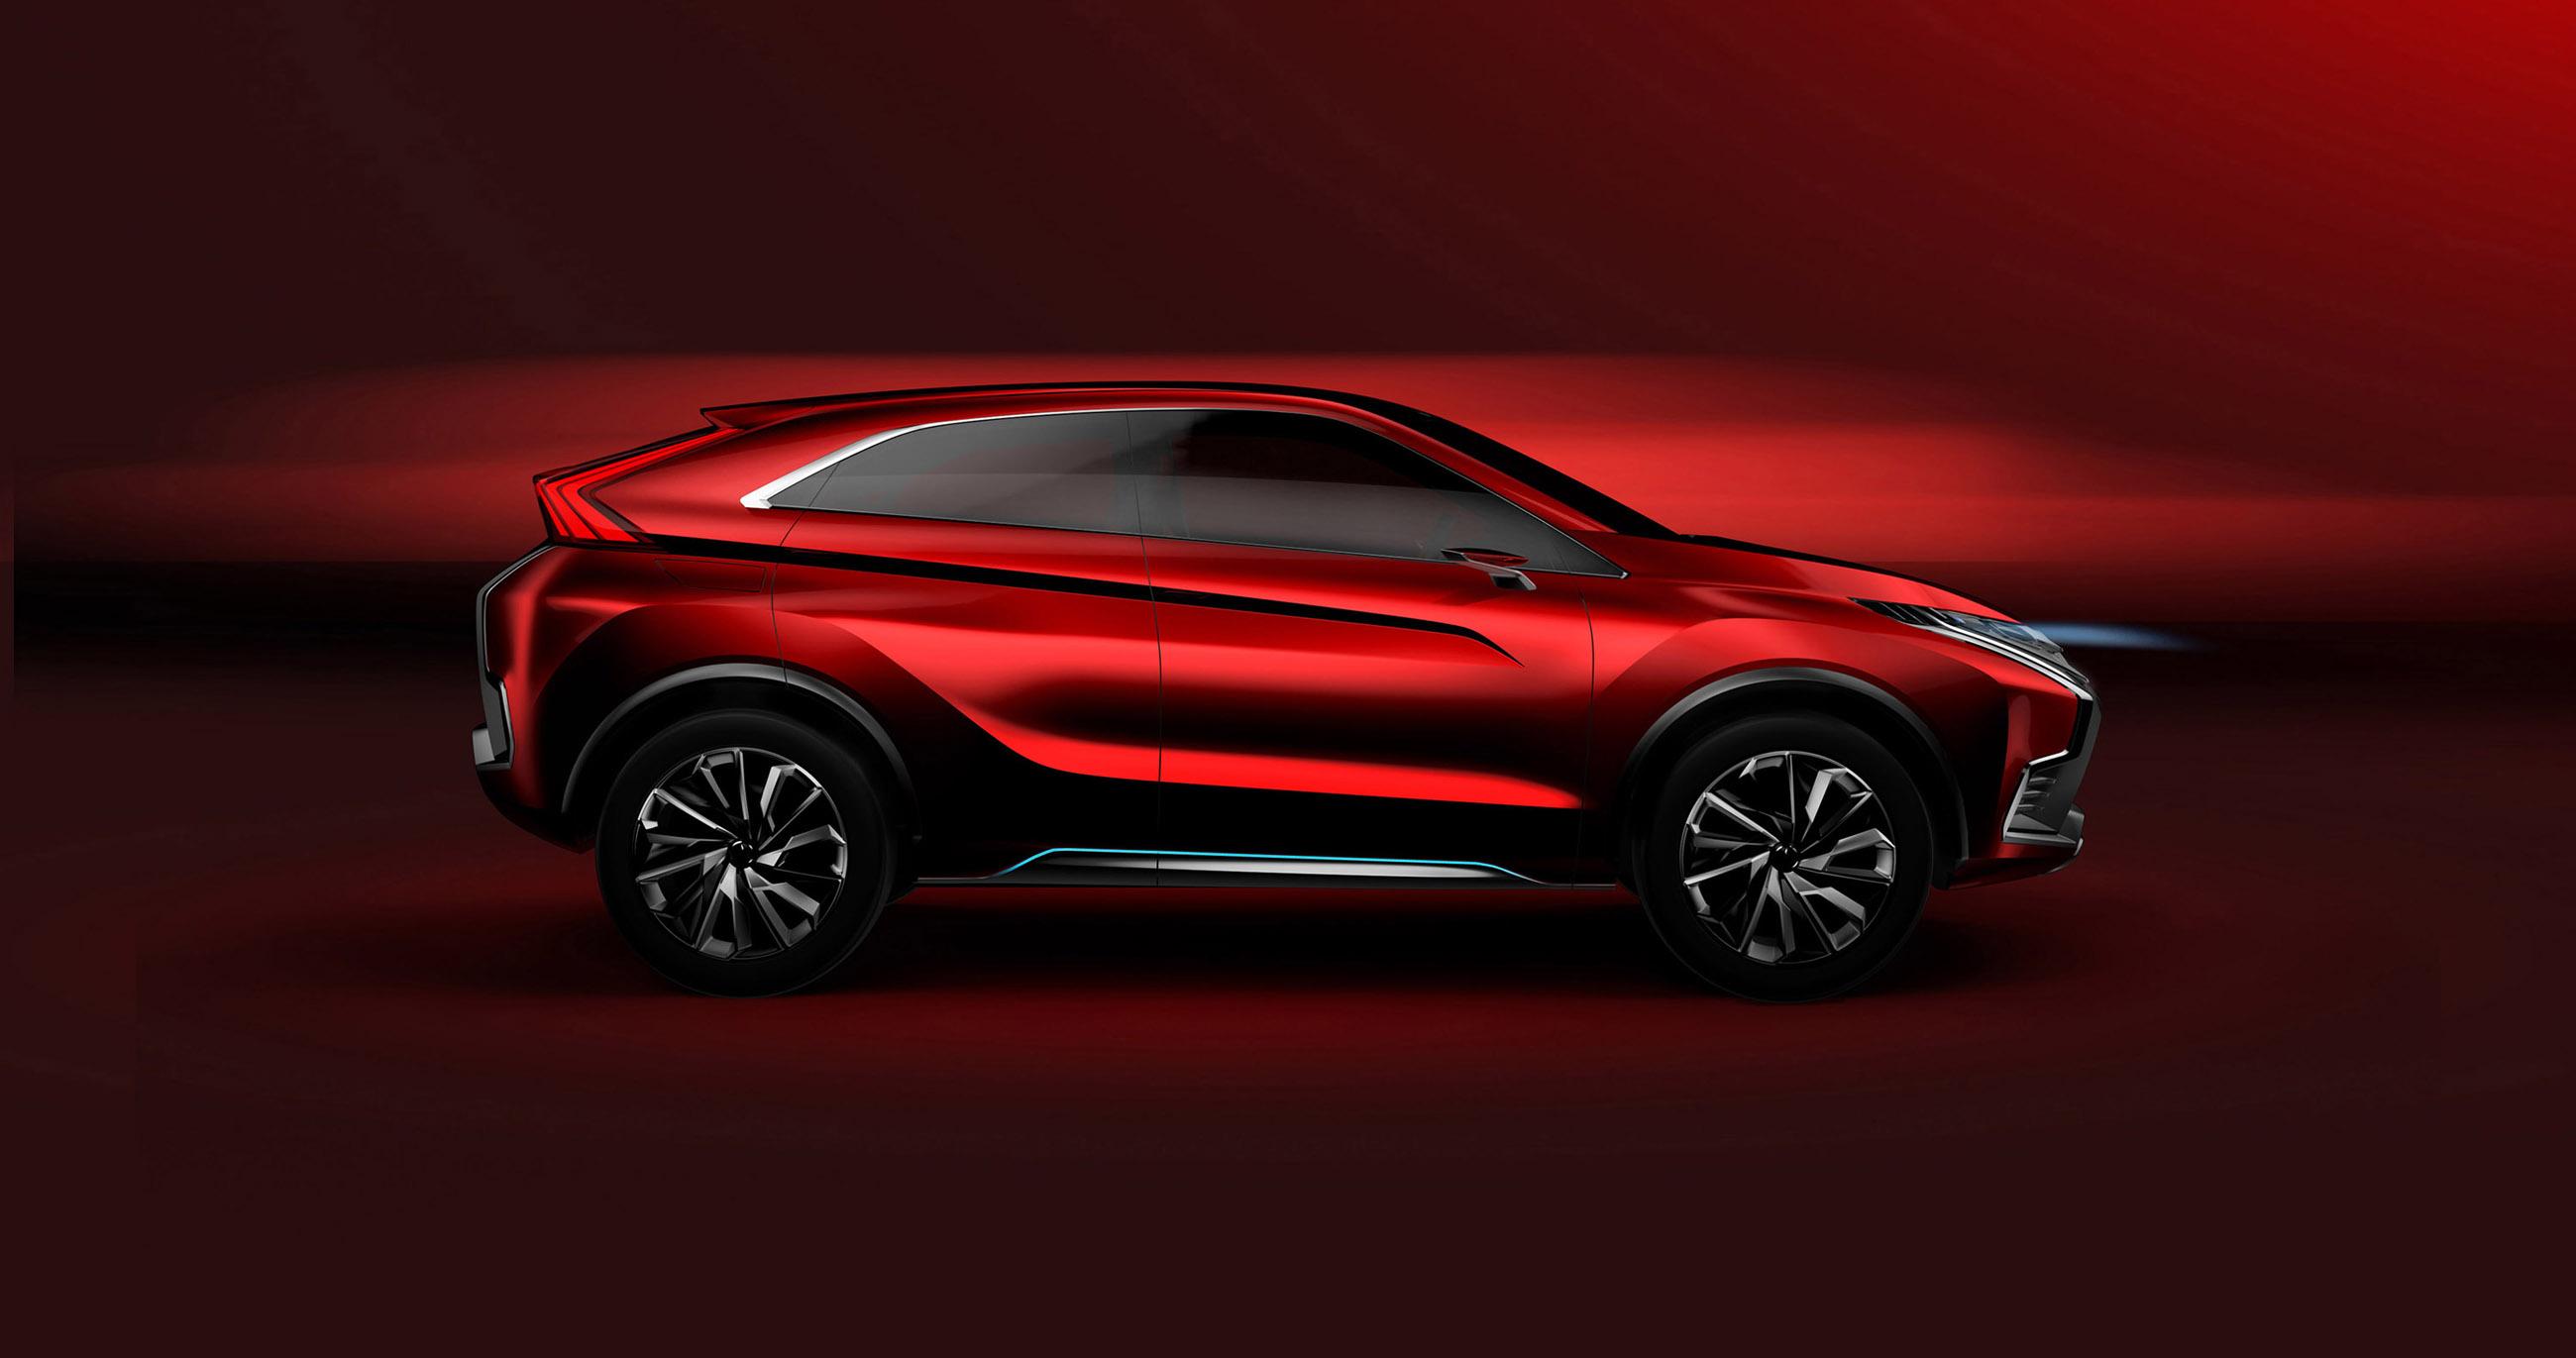 2015 Mitsubishi XR-PHEV II Concept